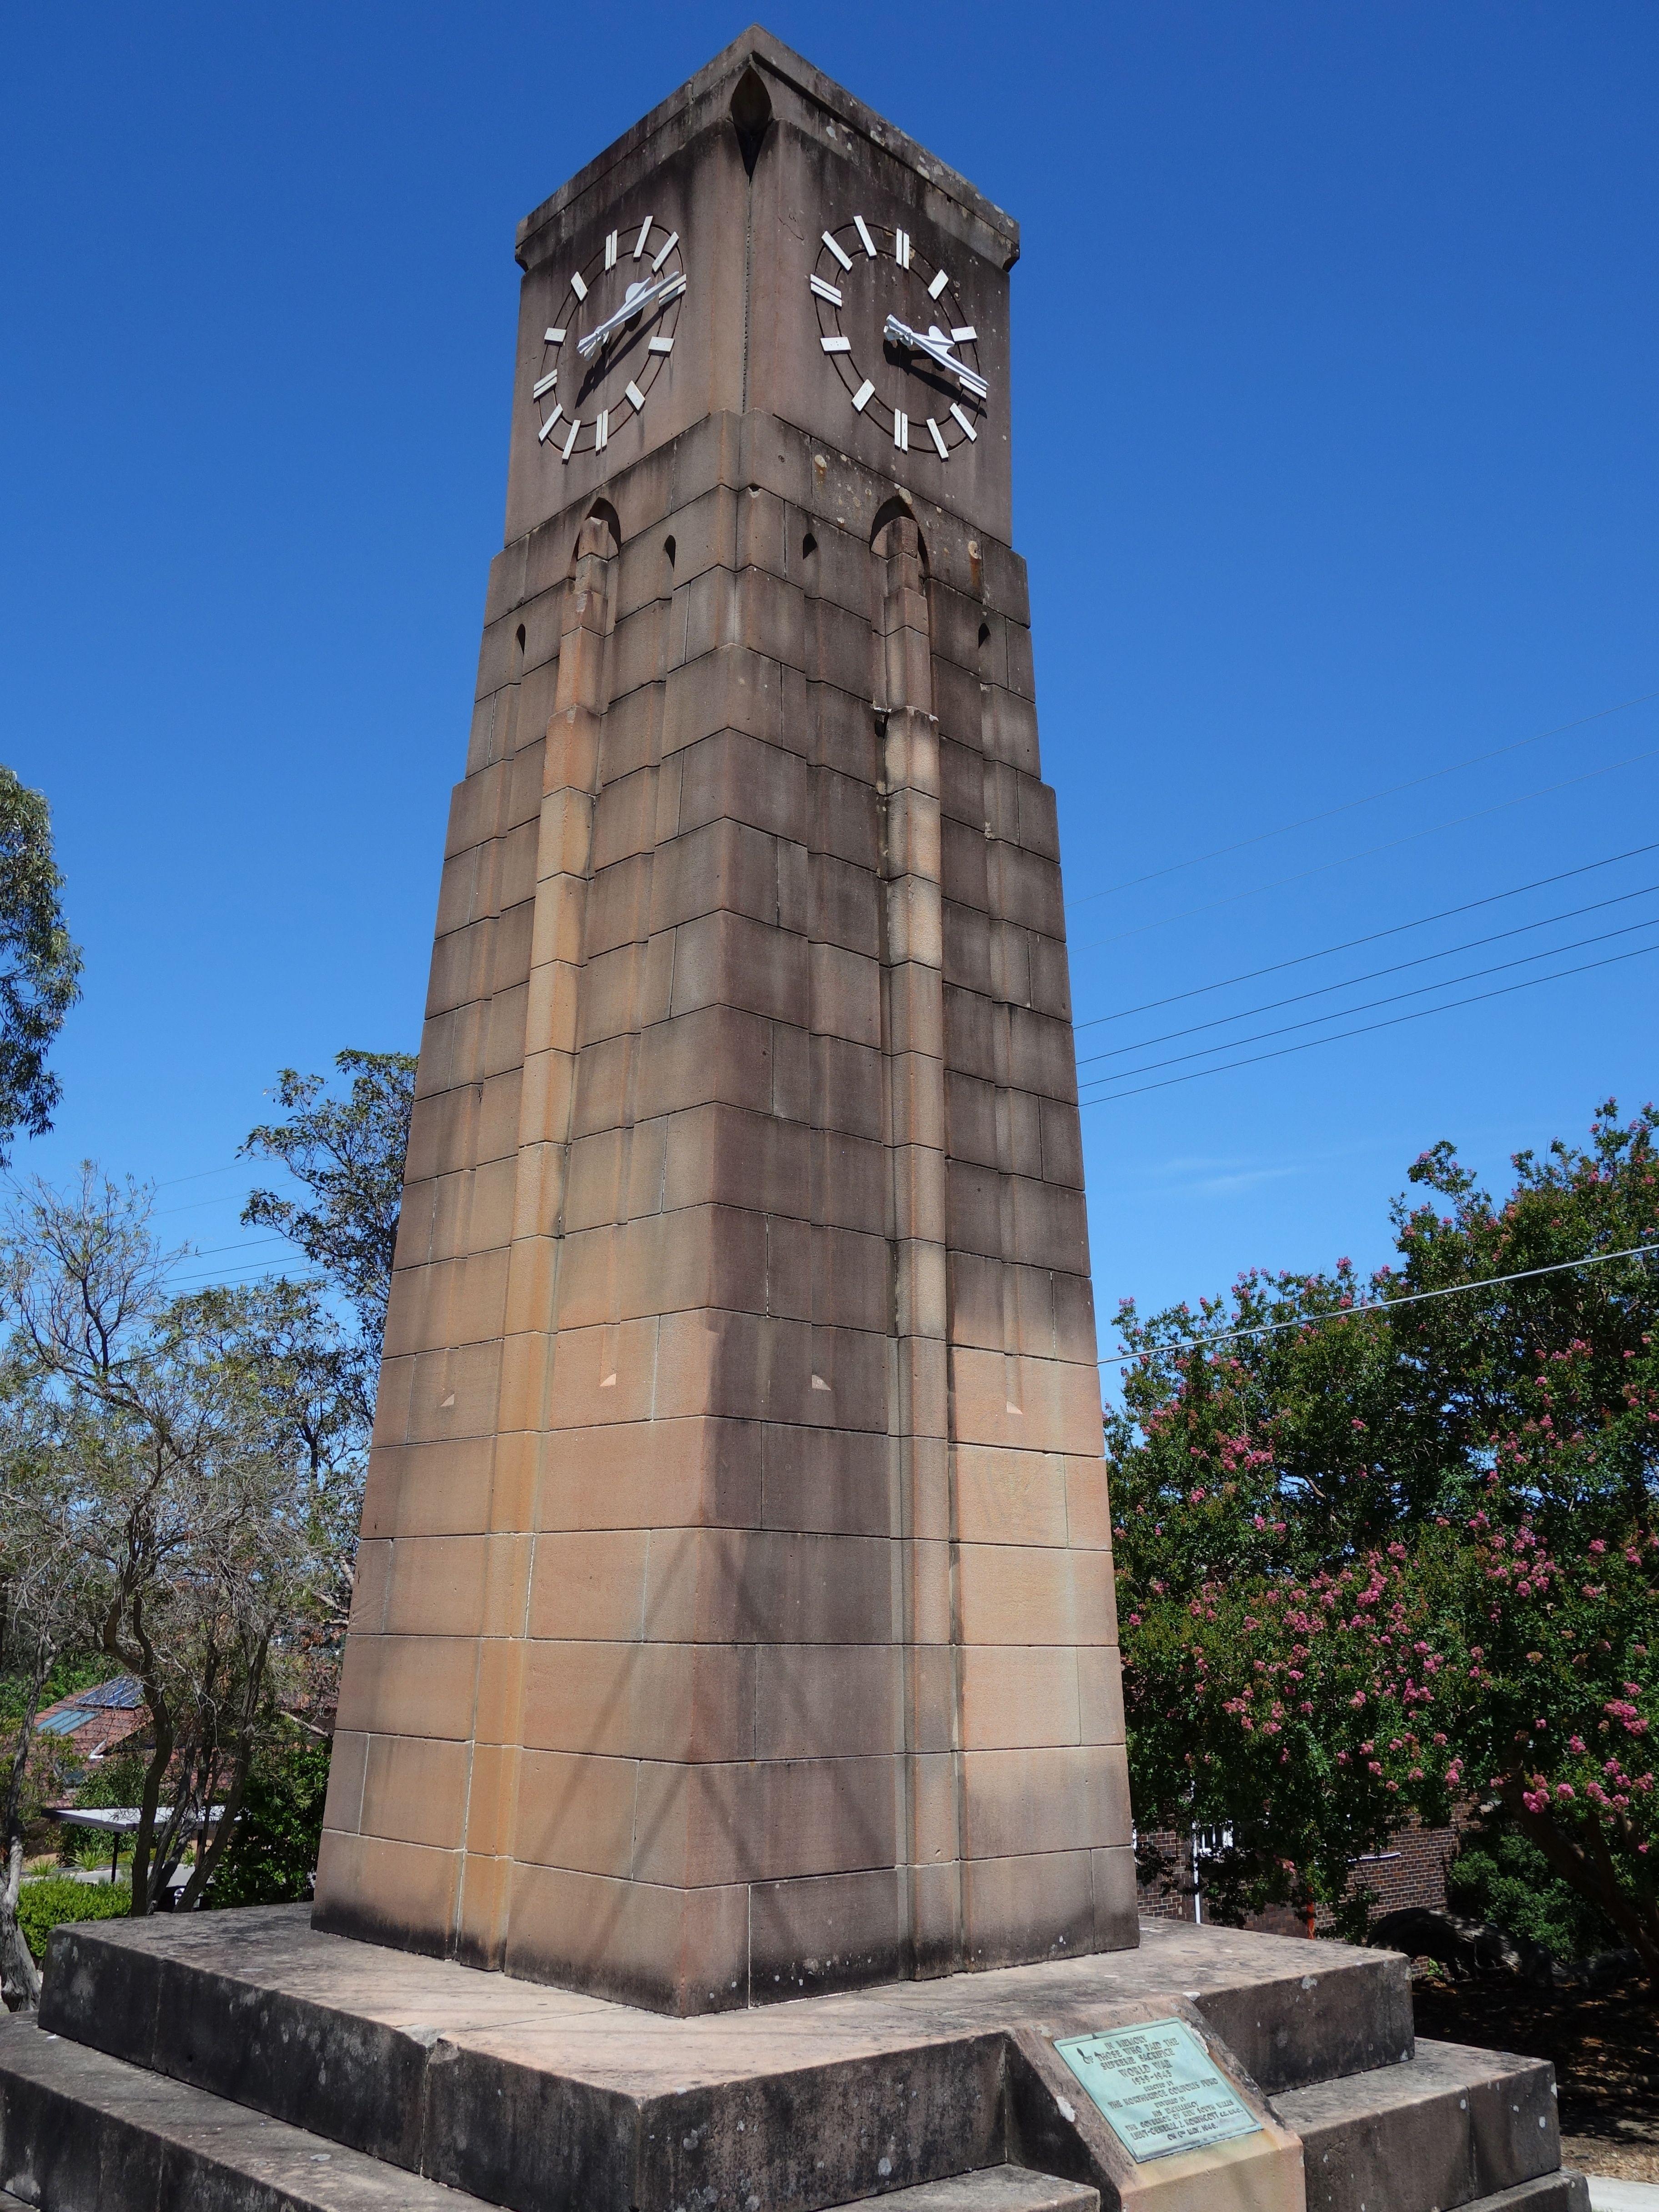 northbridge clock